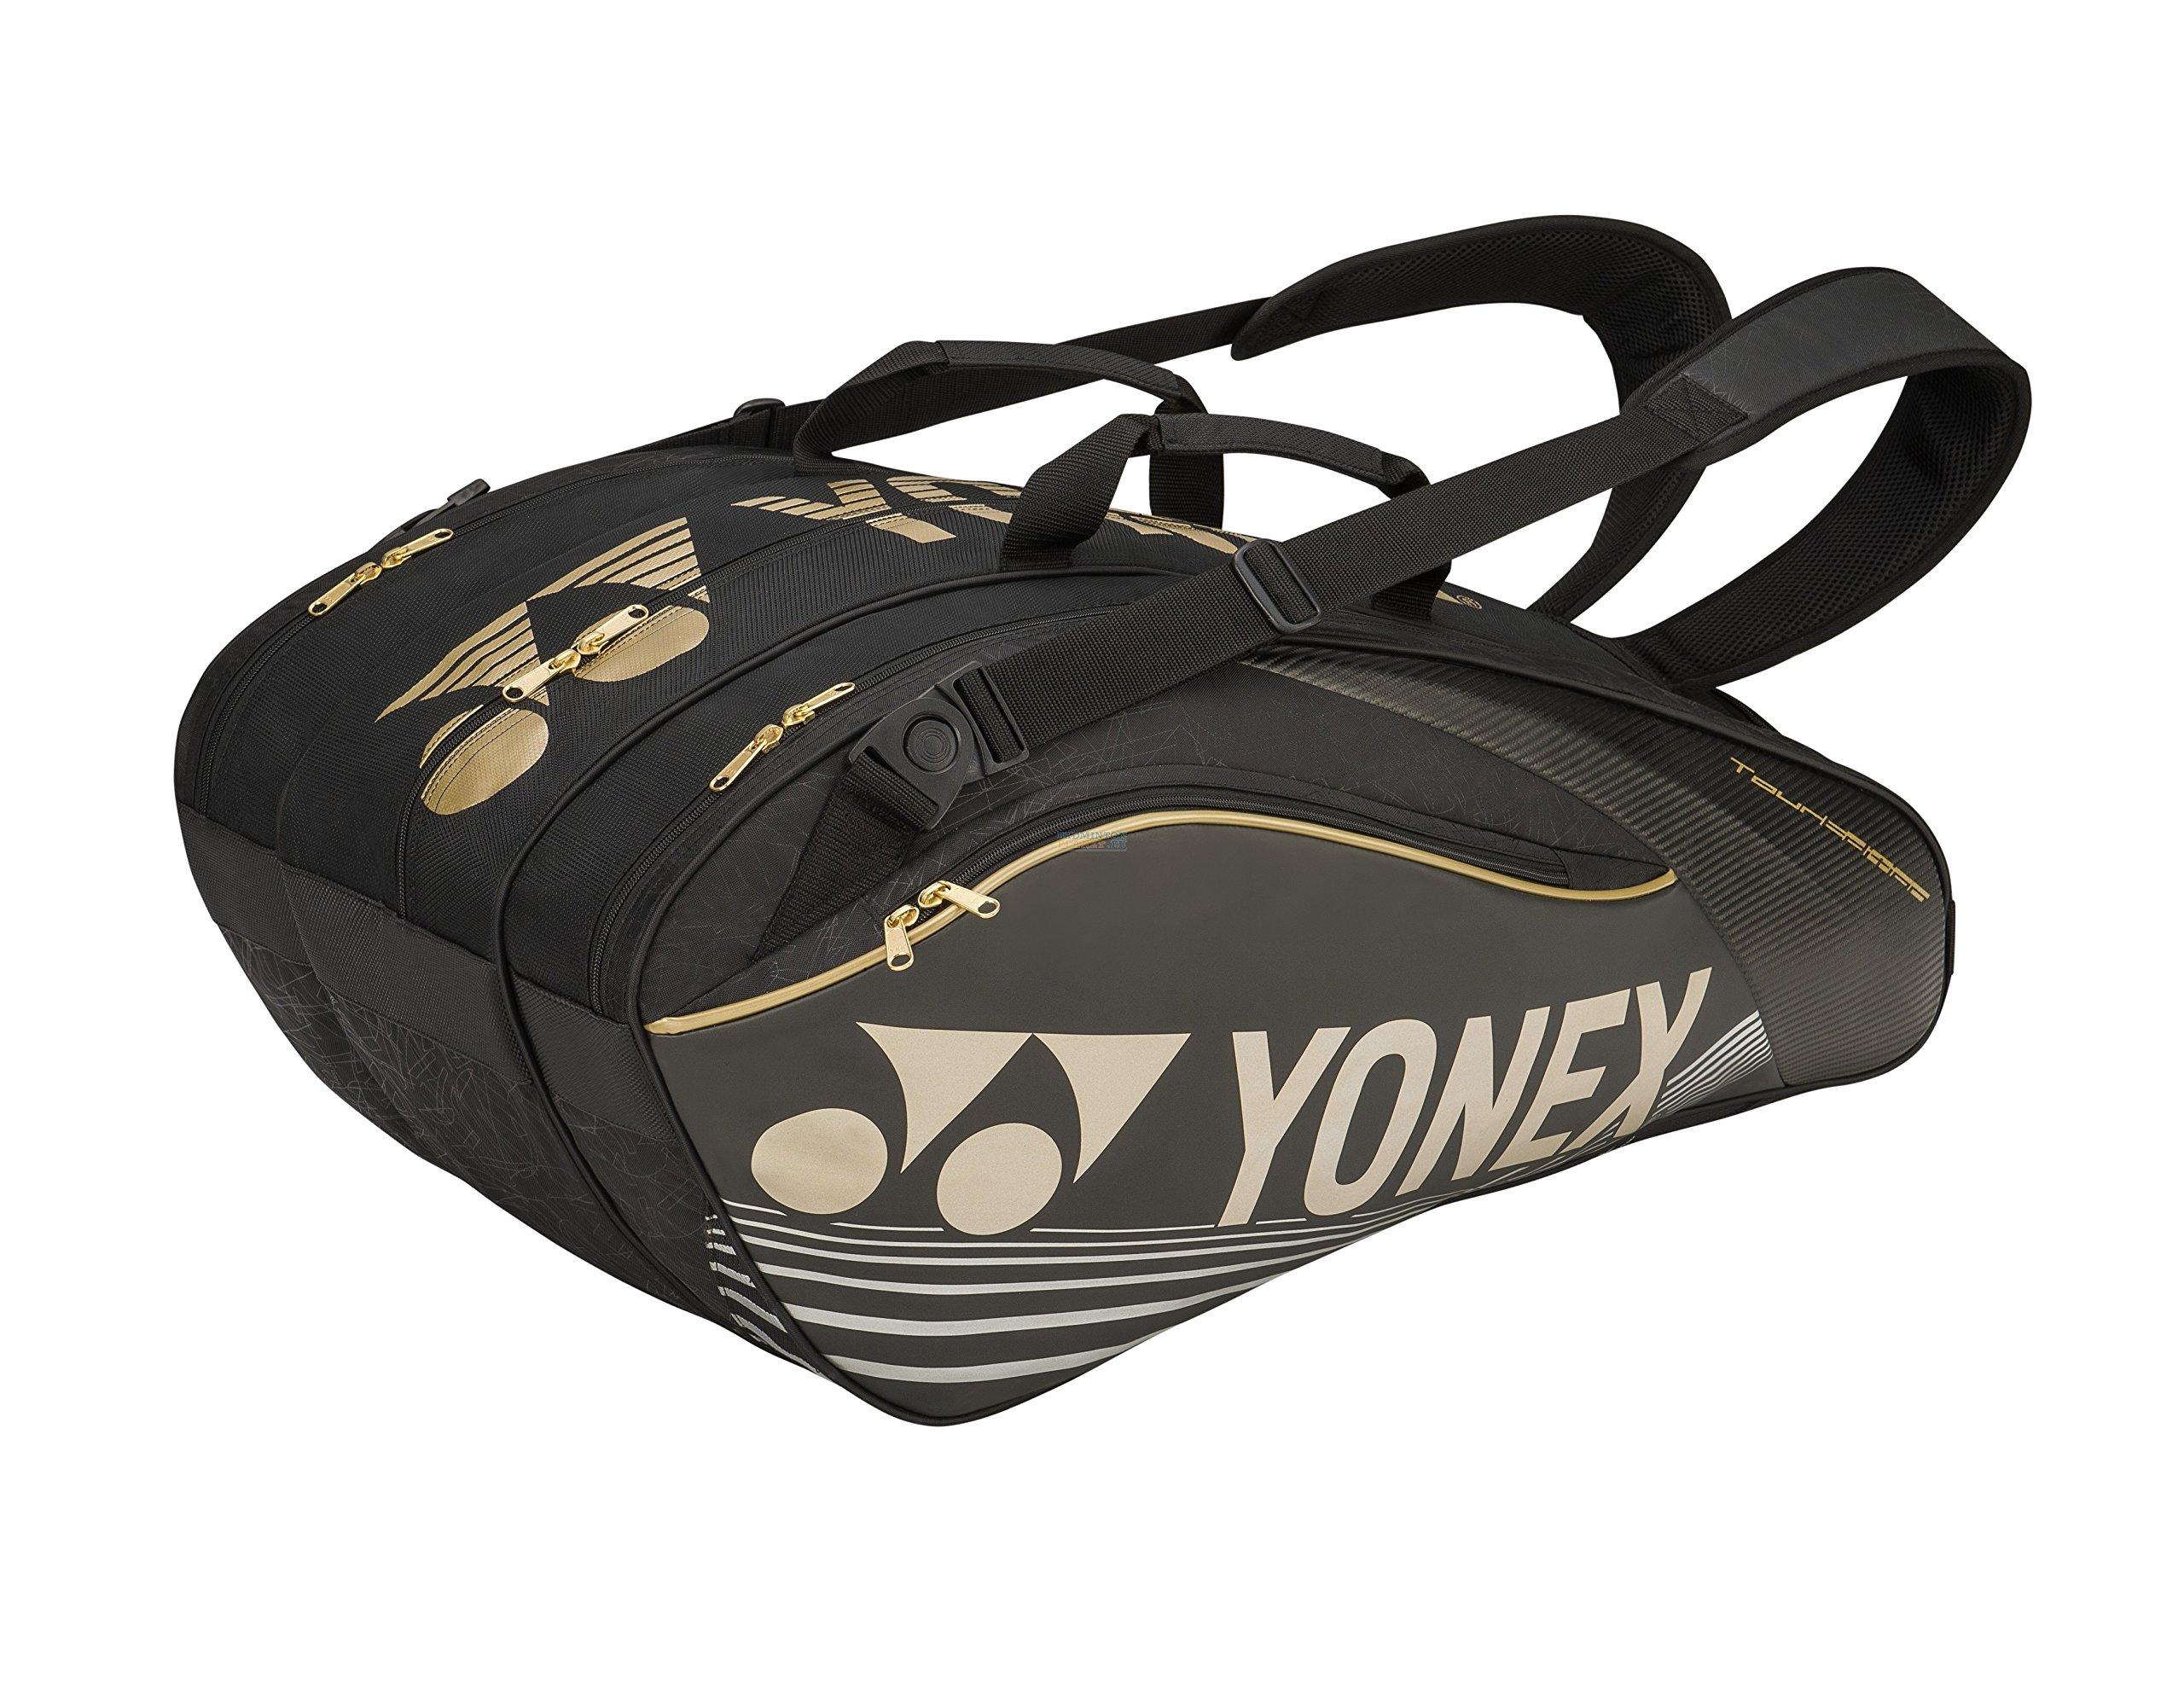 Yonex Pro Racket Bag 9629 EX, BLACK